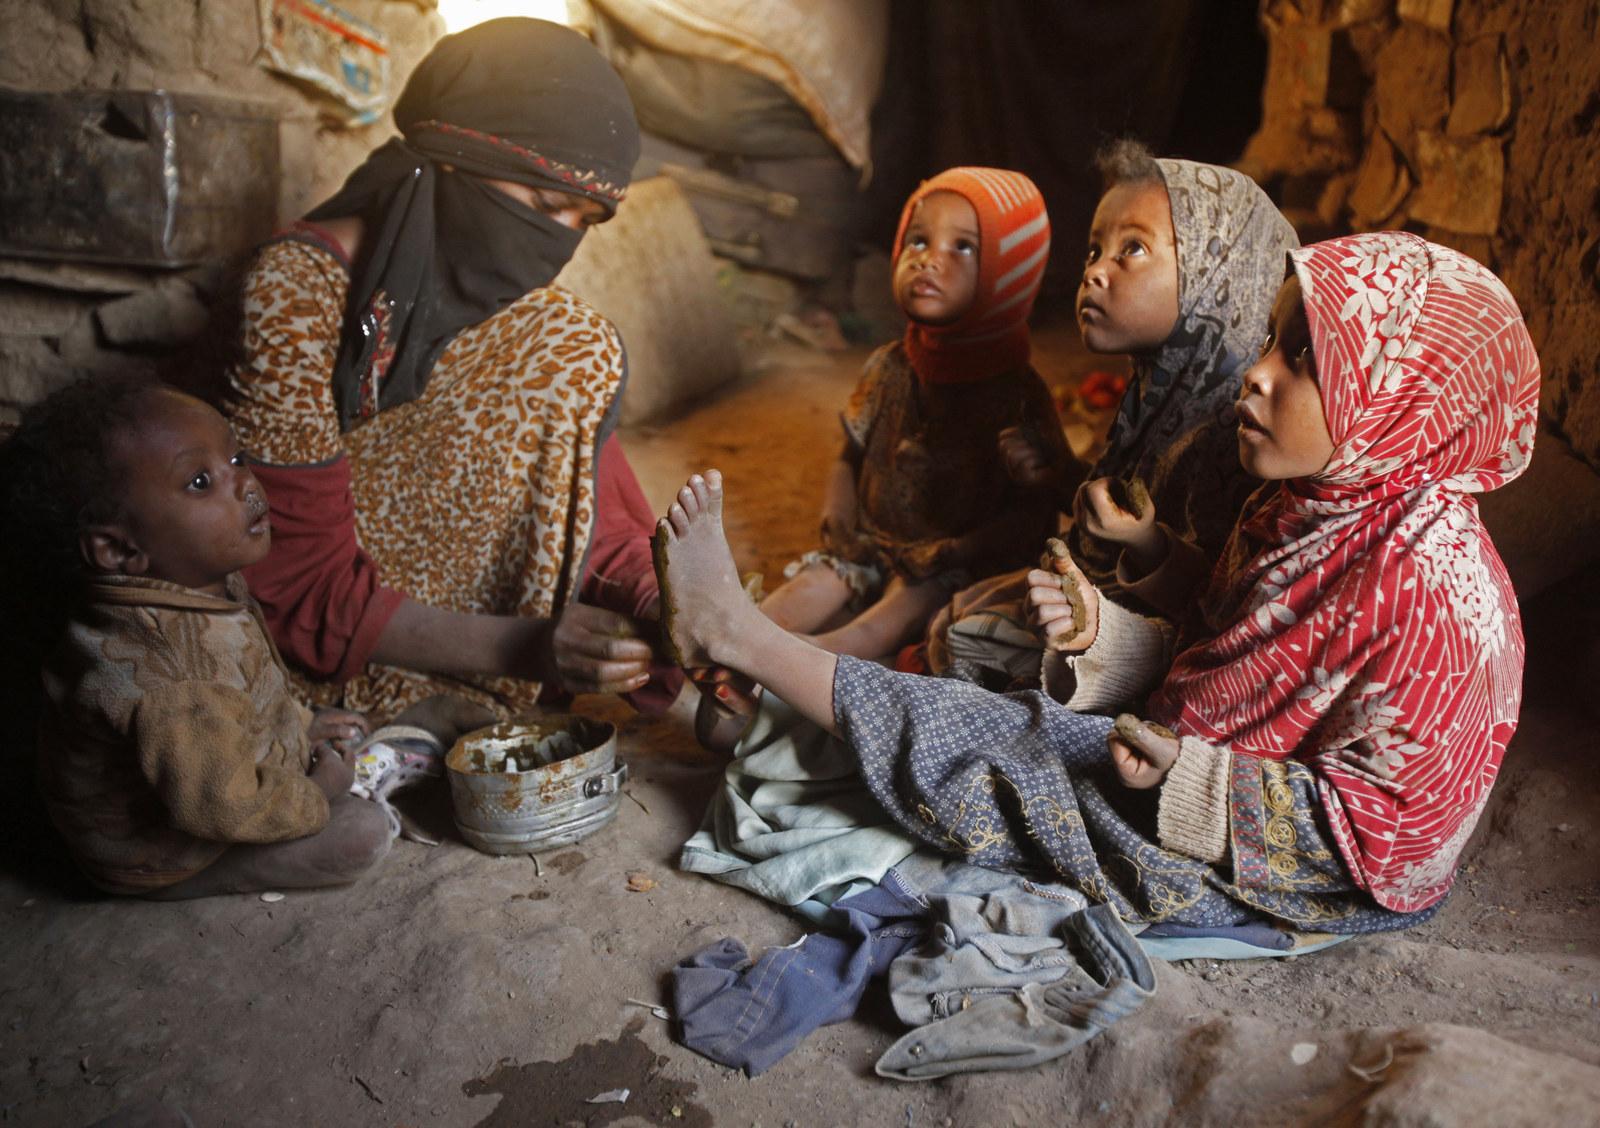 Saudis Warned Over Marrying Unidentified Yemen Women